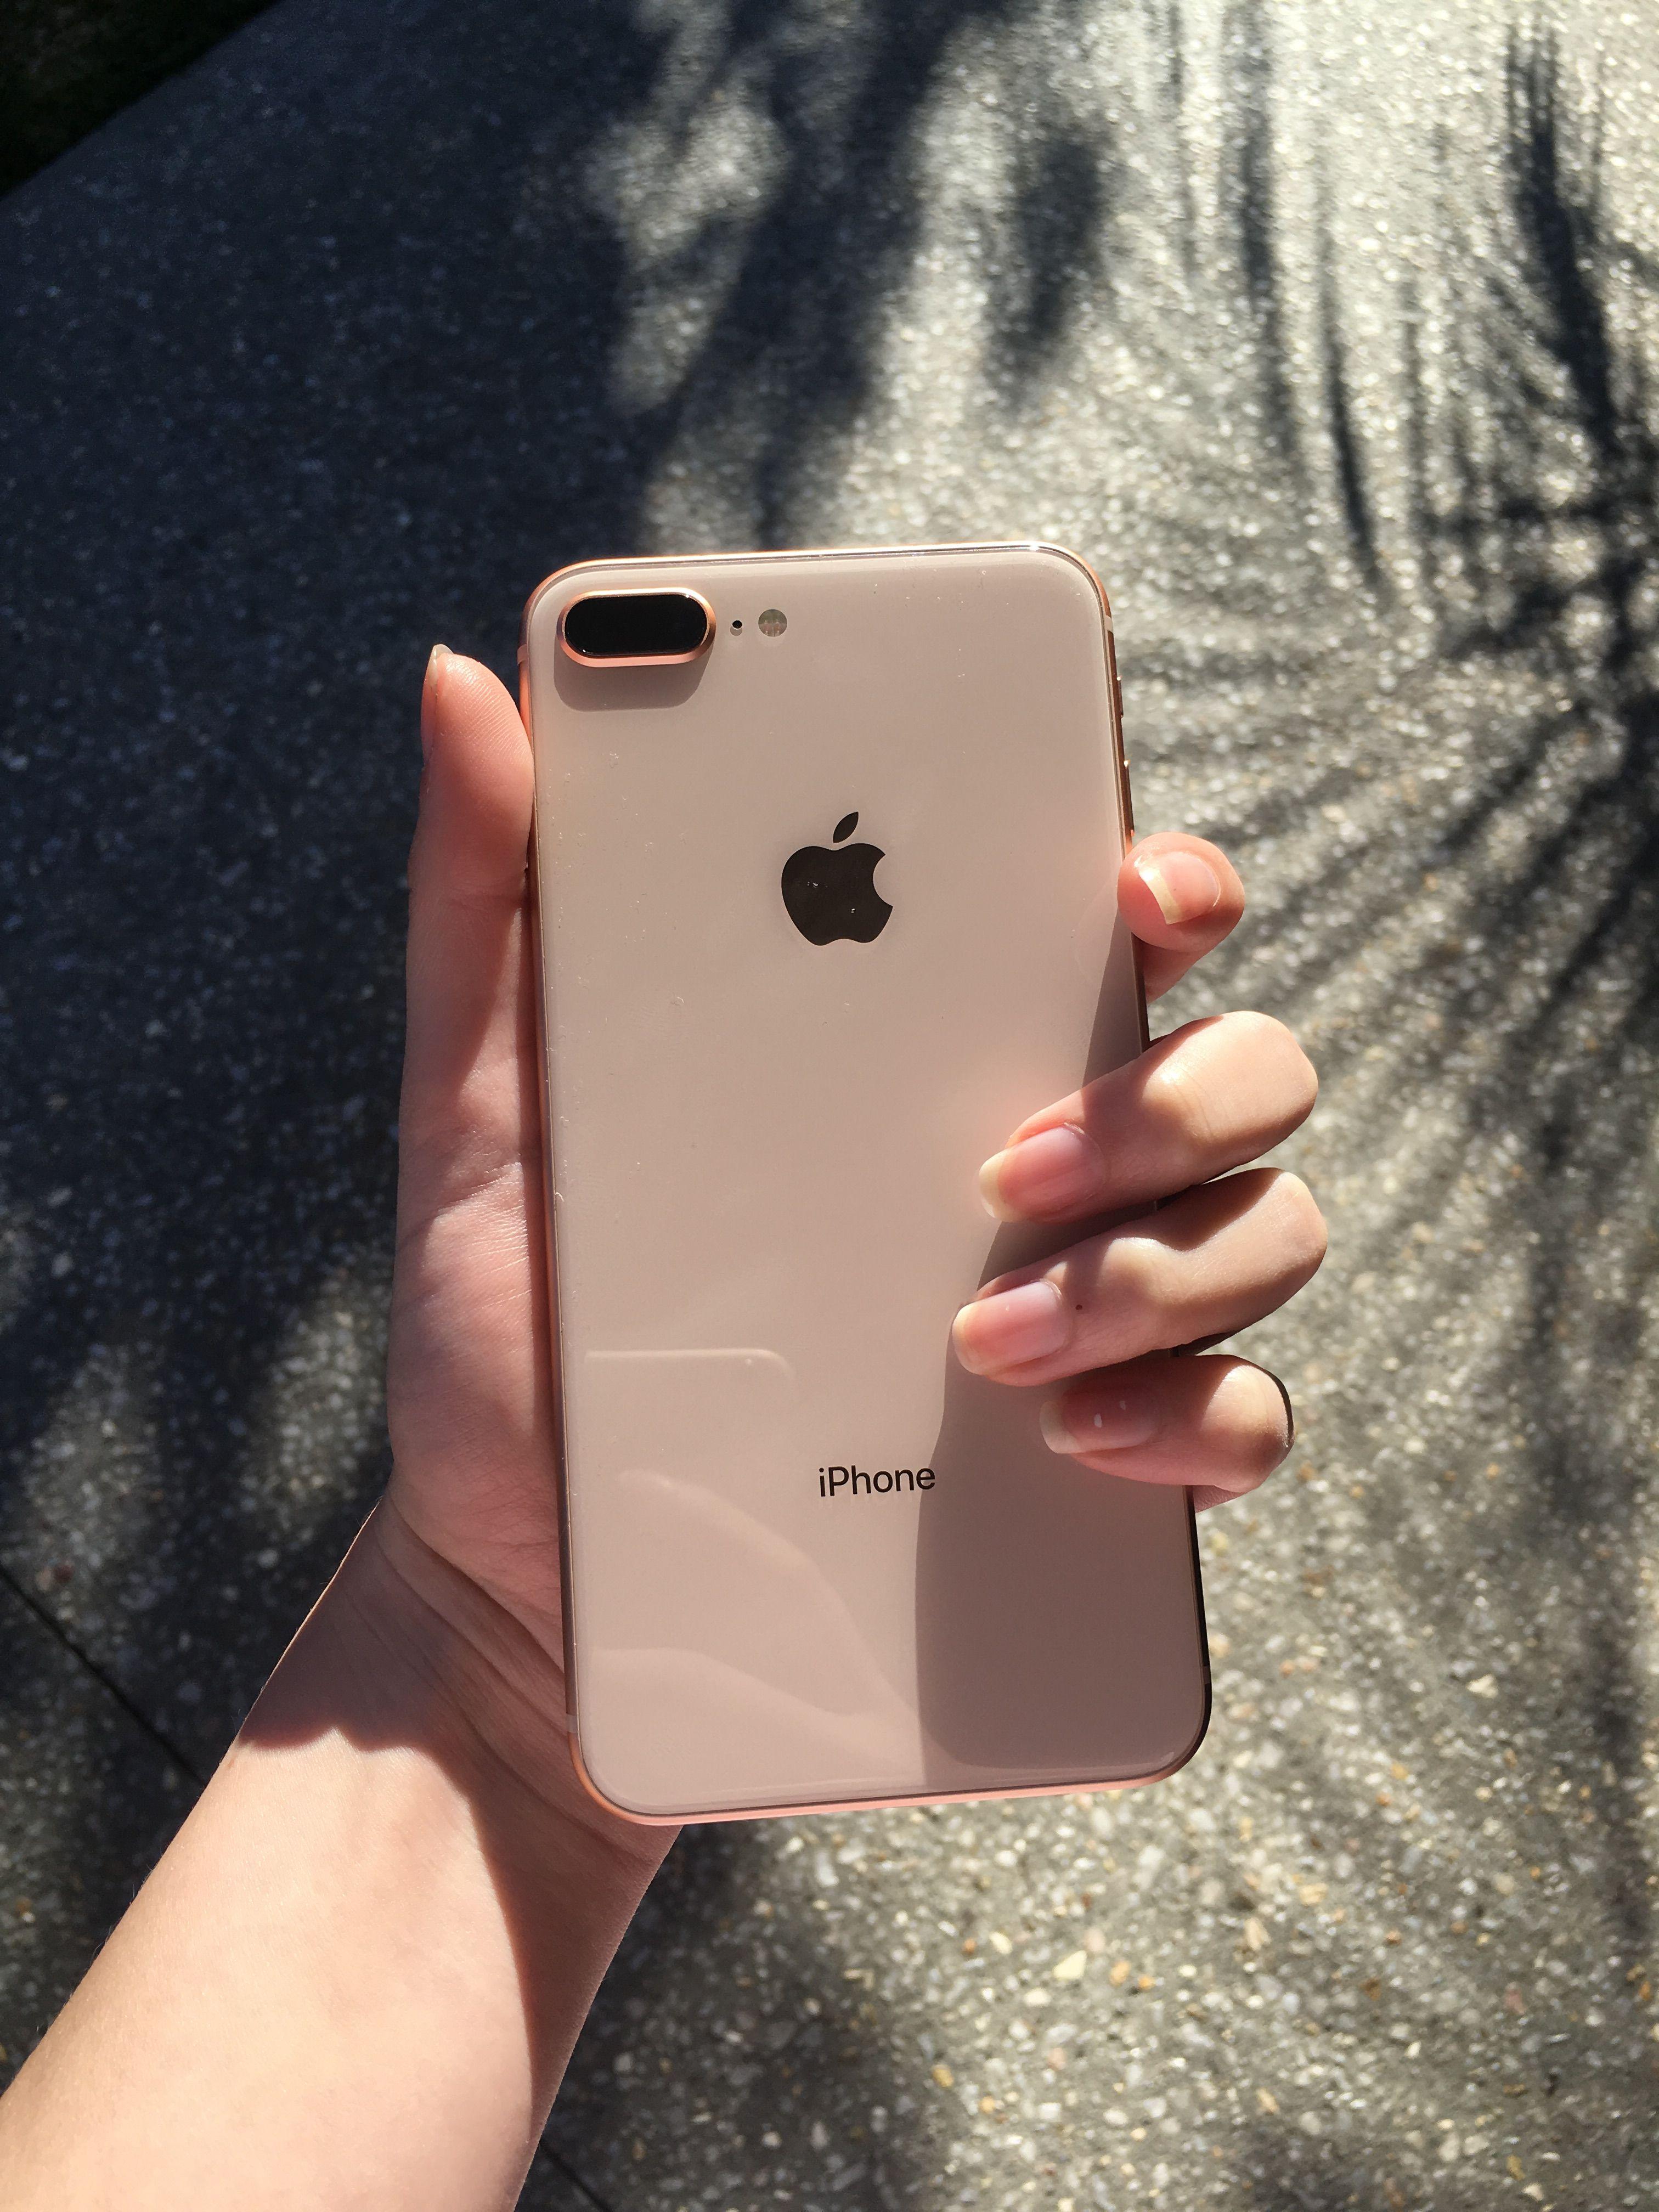 Pin Van Jasmin Martinez Op Things Telefoonhoesjes Telefoonhoesje Iphone